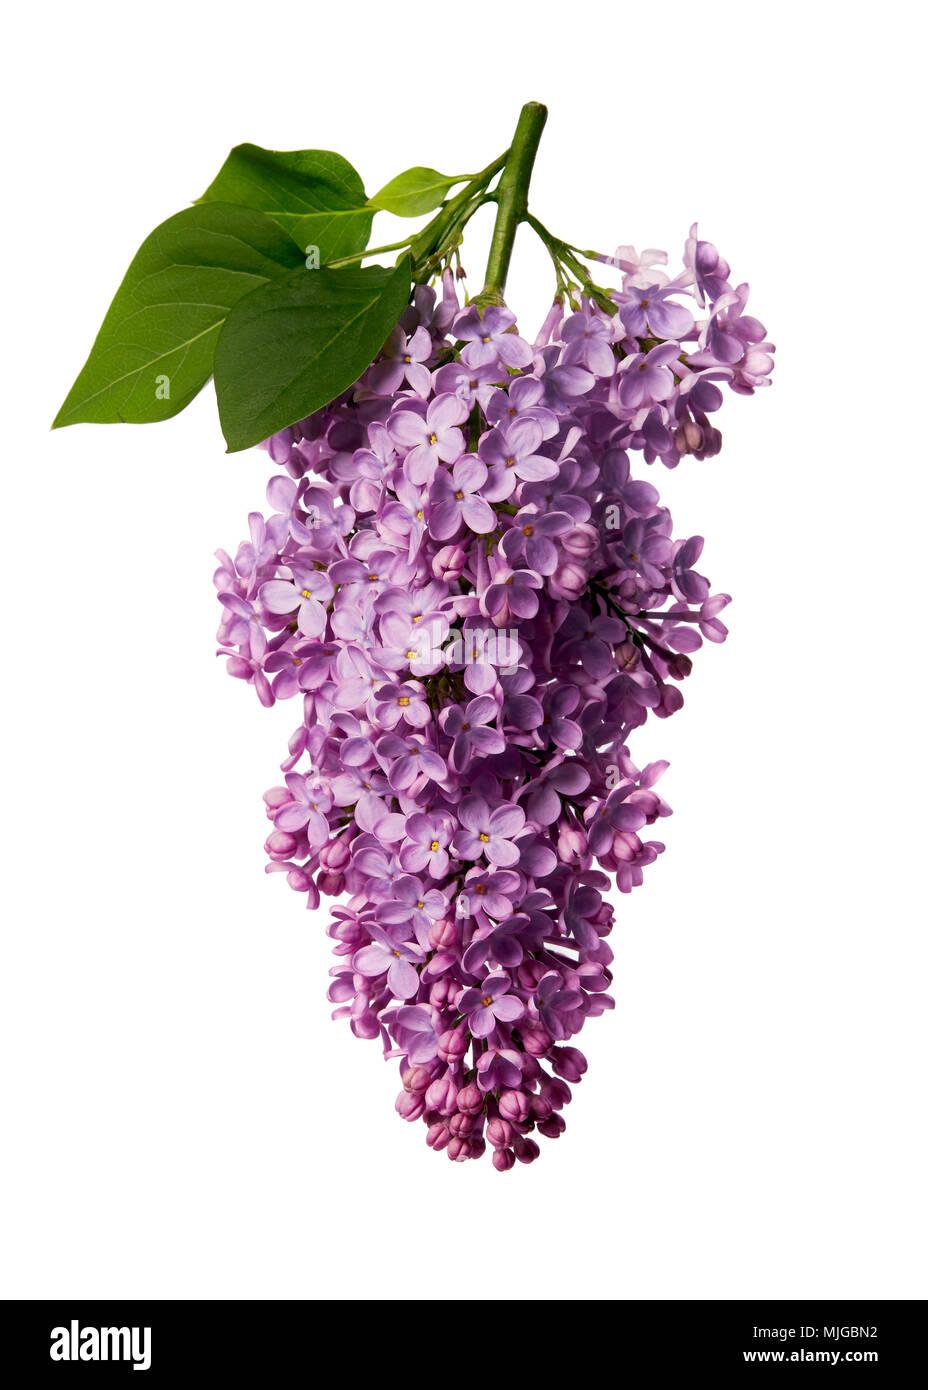 Syringa vulgaris, Lila. Lila Lila Blumen auf weißem Hintergrund. Stockbild